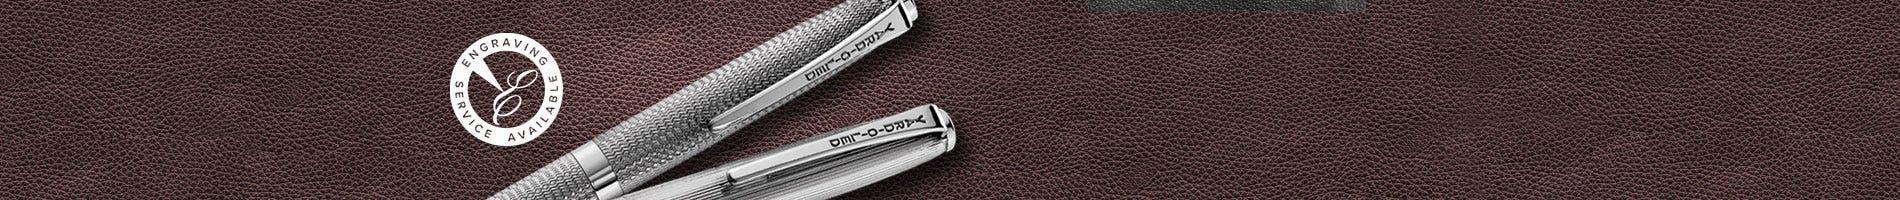 yard-o-led perfecta victorian rollerball pen